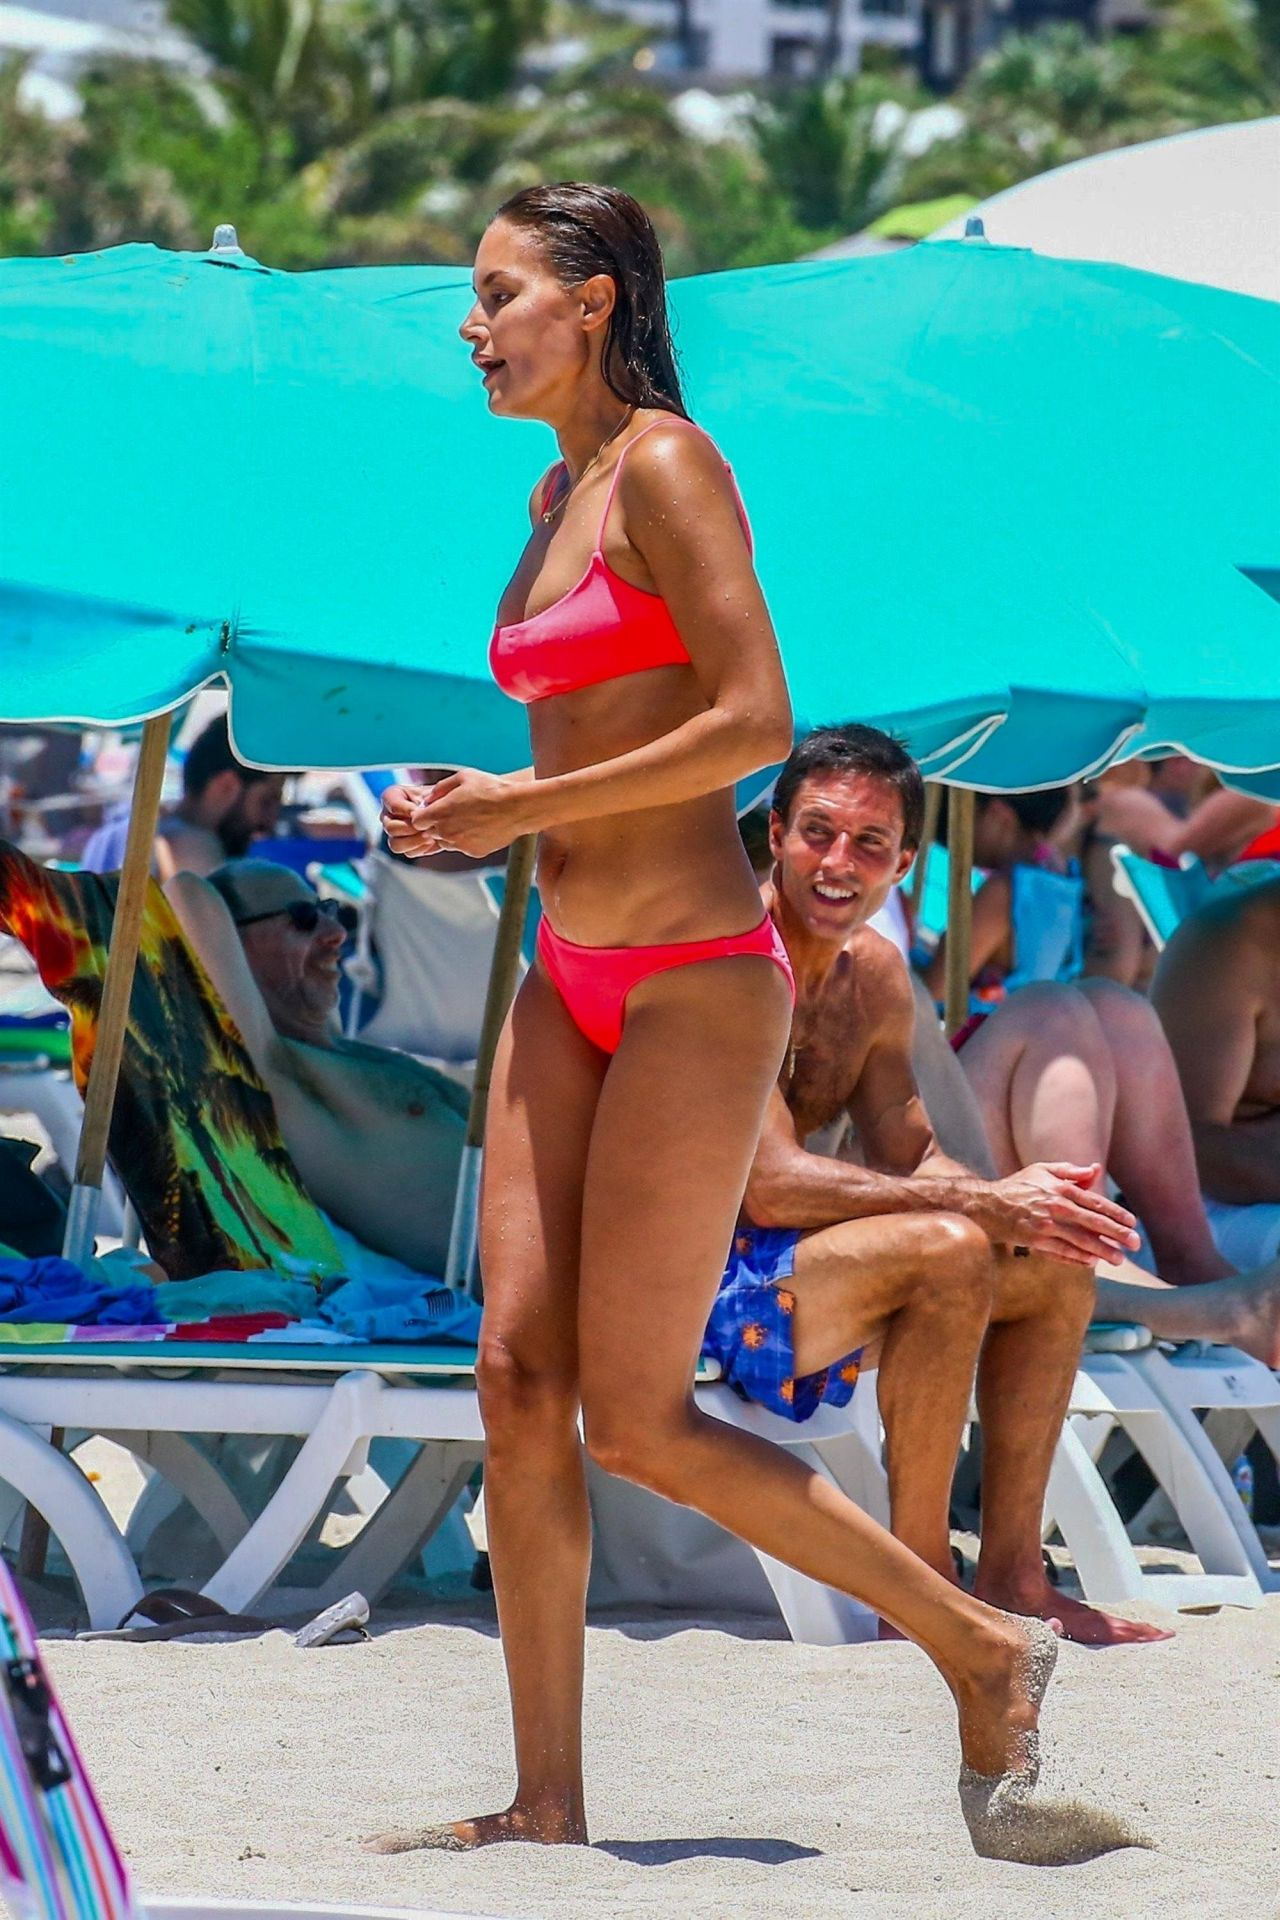 picture Anne marie kortright in a pink bikini at miami beach